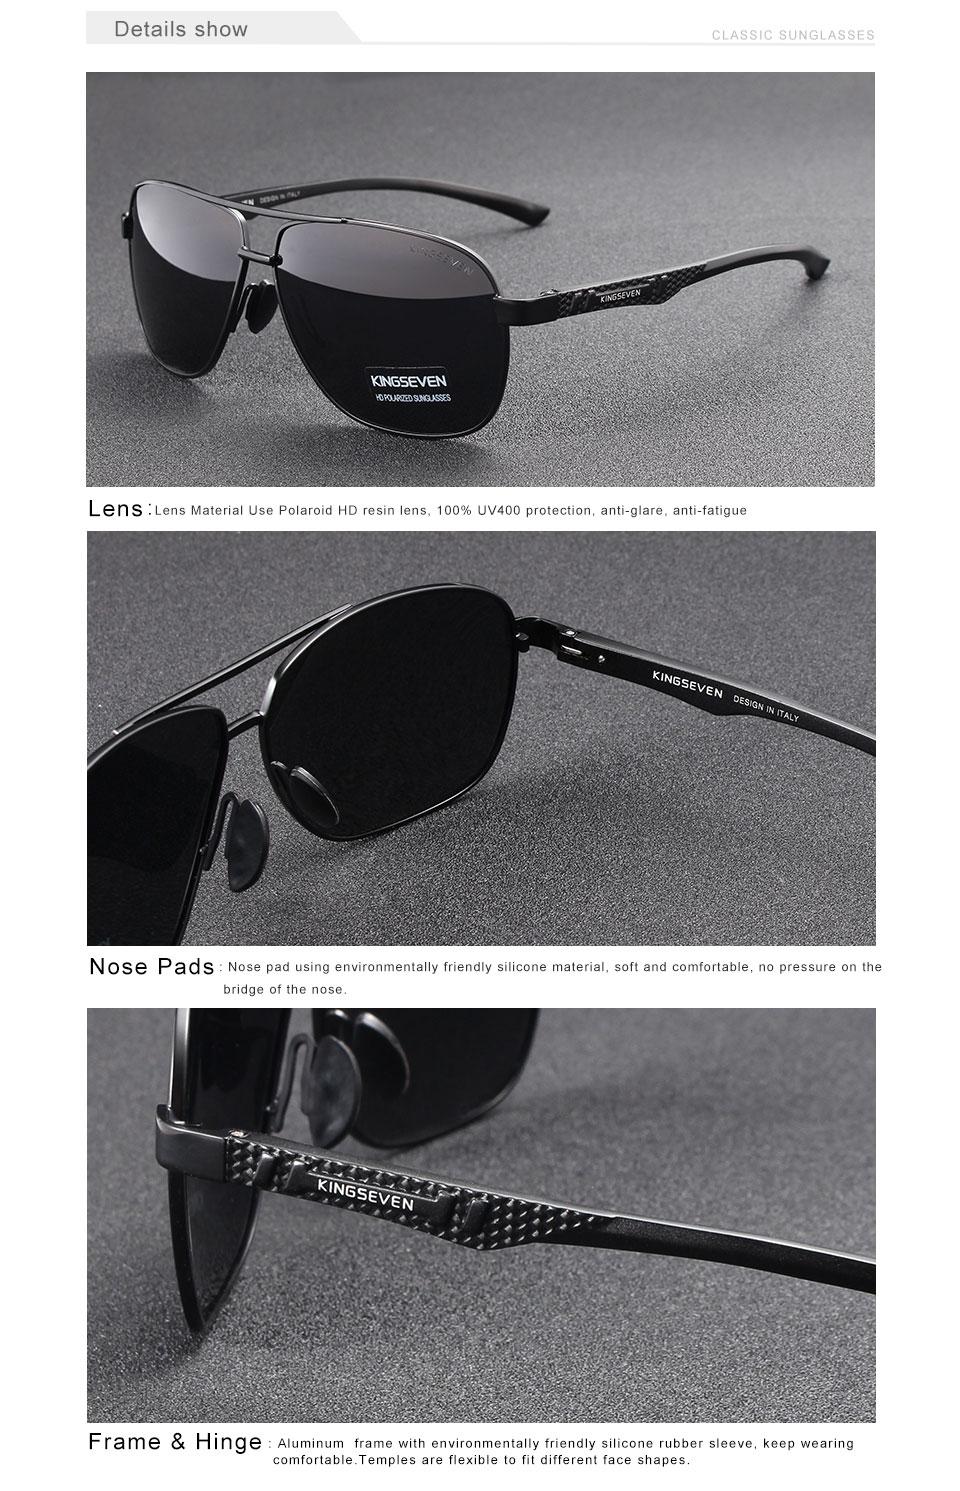 HTB1TMUbaGSWBuNjSsrbq6y0mVXac GIFTINGER 2020 Brand Men Aluminum Sunglasses Polarized UV400 Mirror Male Sun Glasses Women For Men Oculos de sol